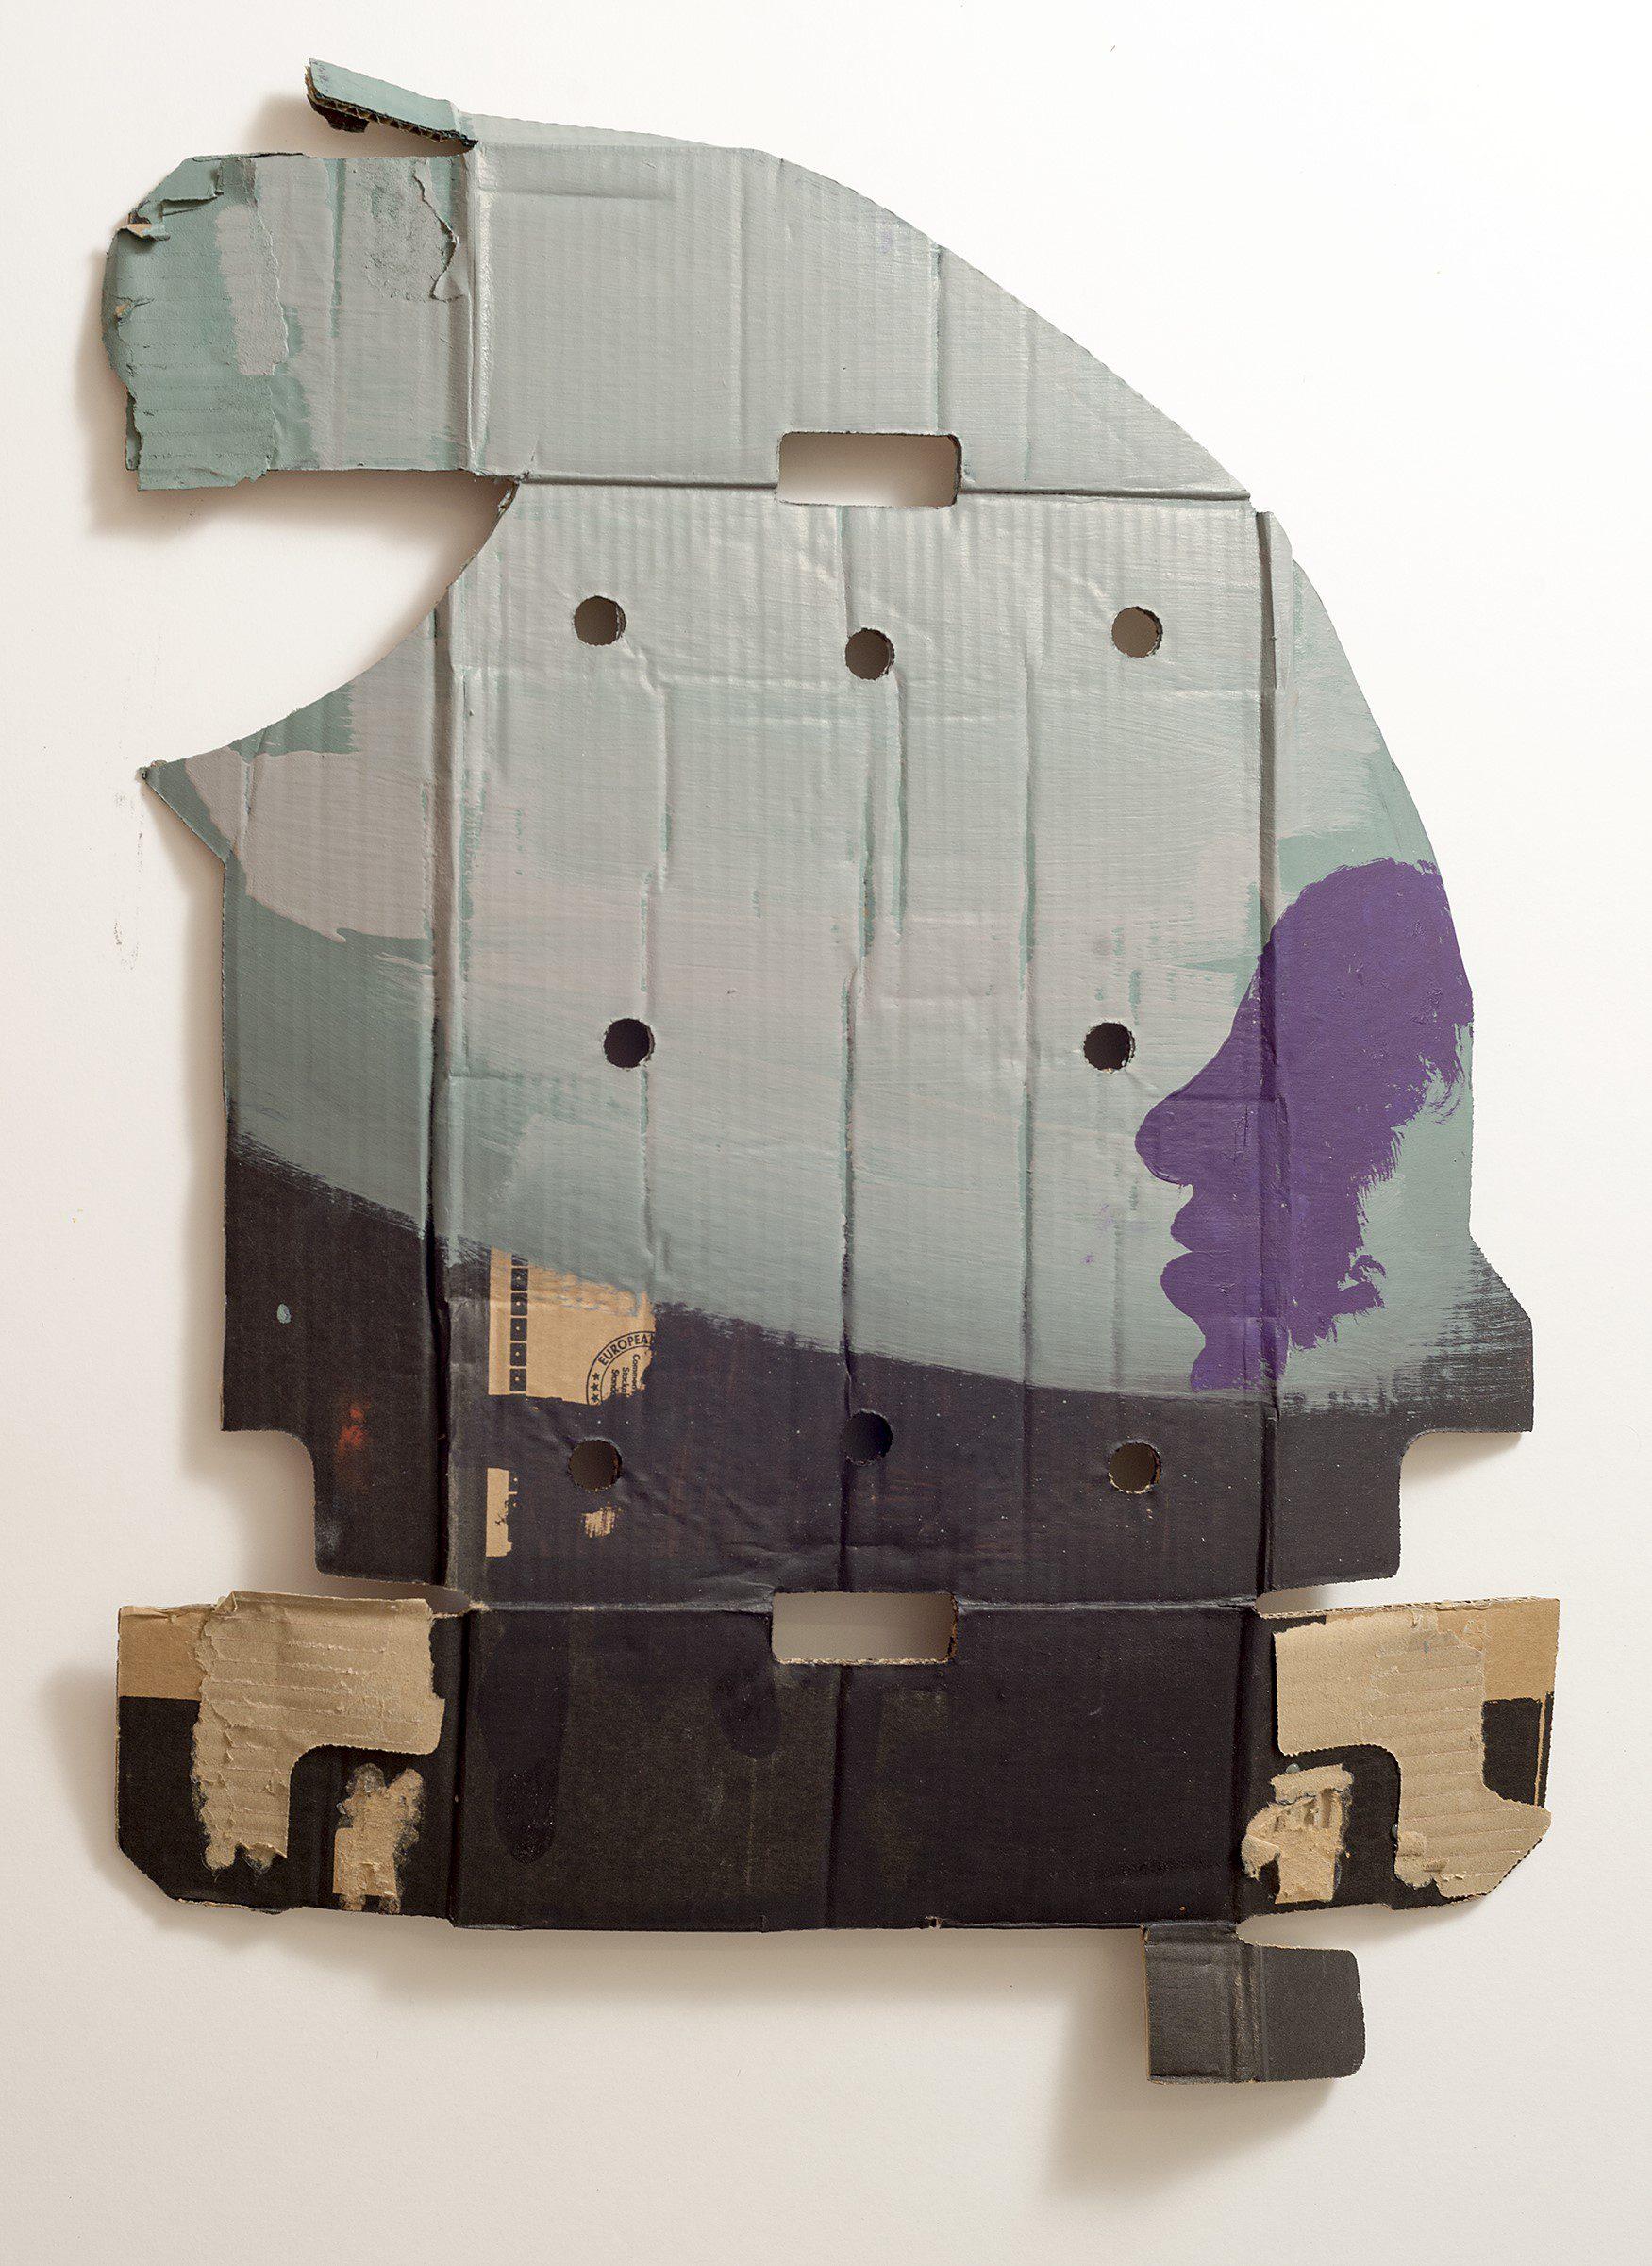 o.T. (Kleines Profil), 2014 oil on currogated cardboard 68 x 49 cm